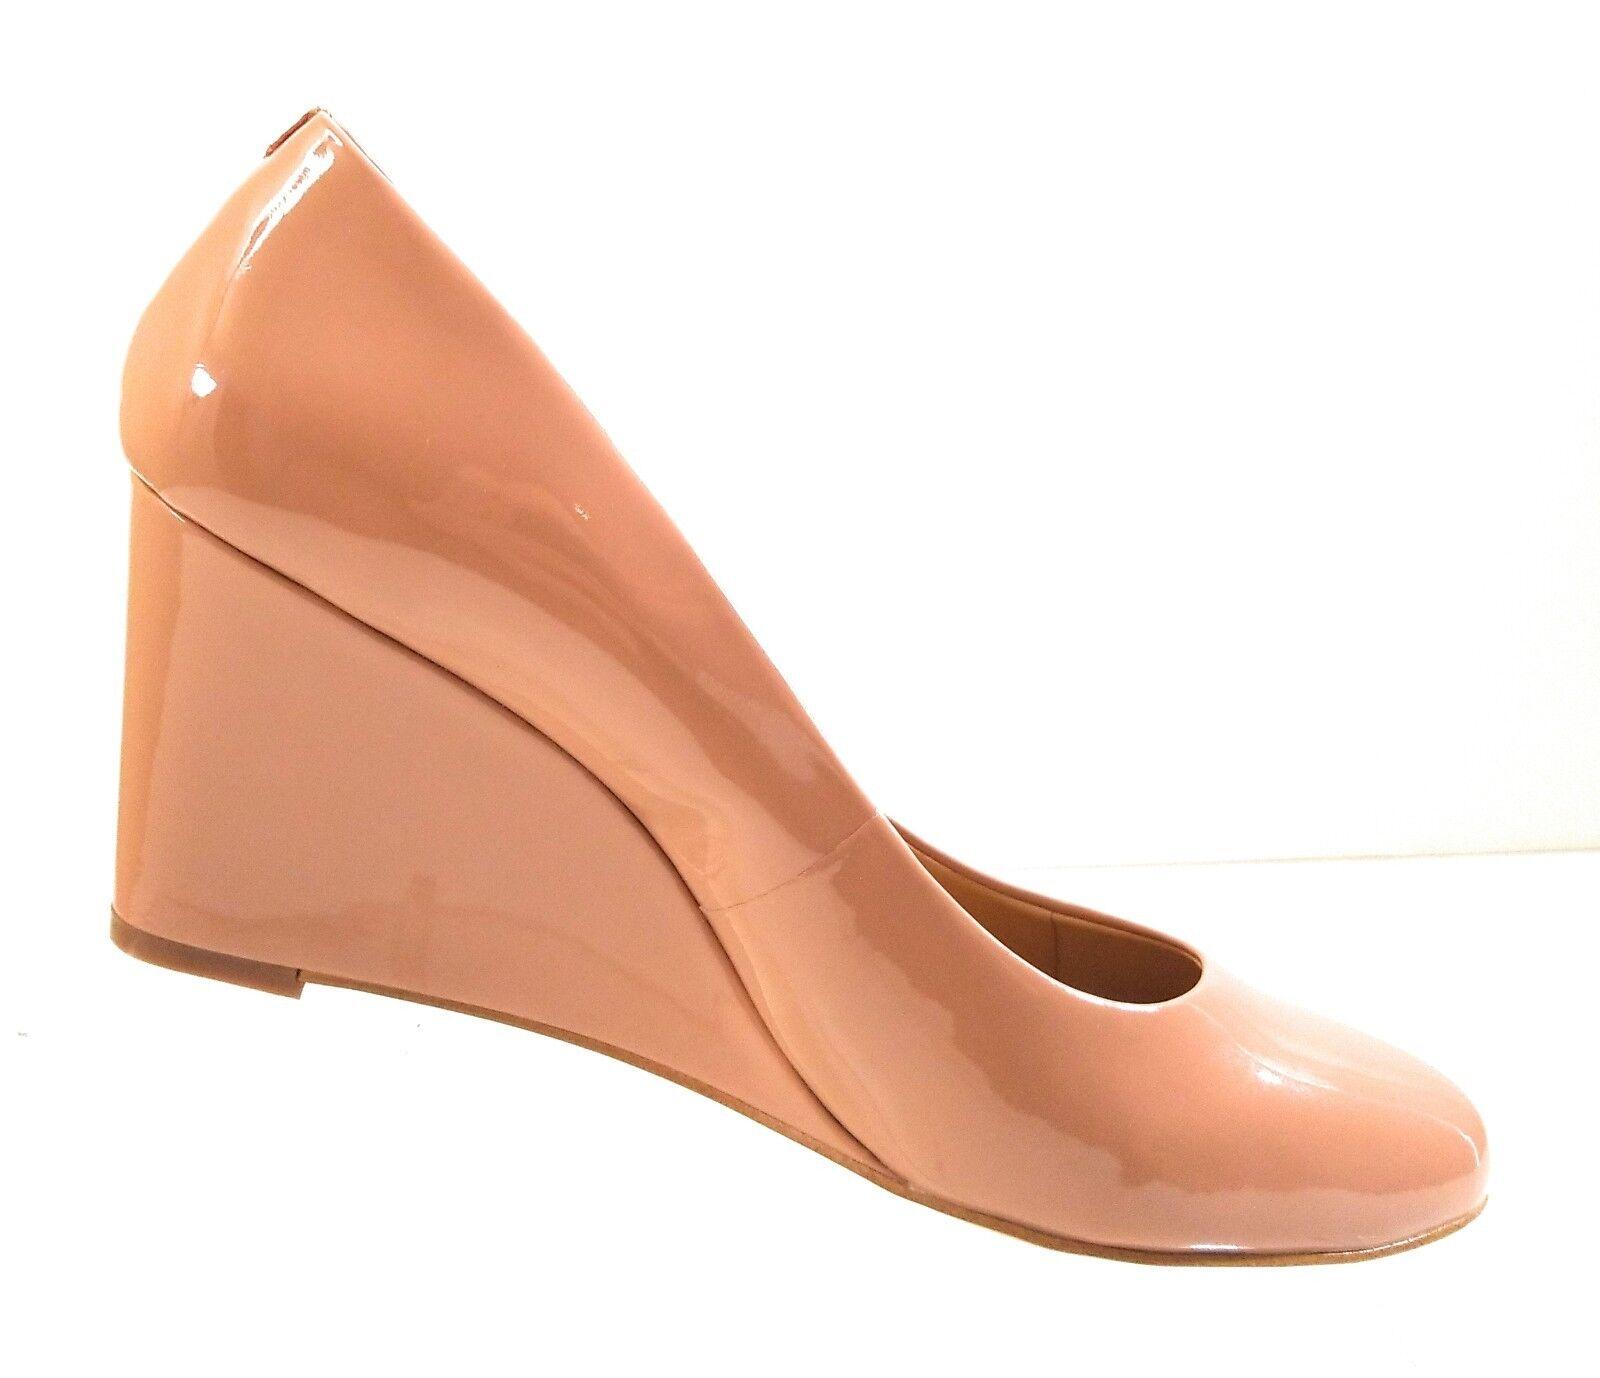 New J J J Crew Sylvia 95993 Women Patent Leather Nude Pumps Heel Wedge shoes Sz 10.5 4366f9